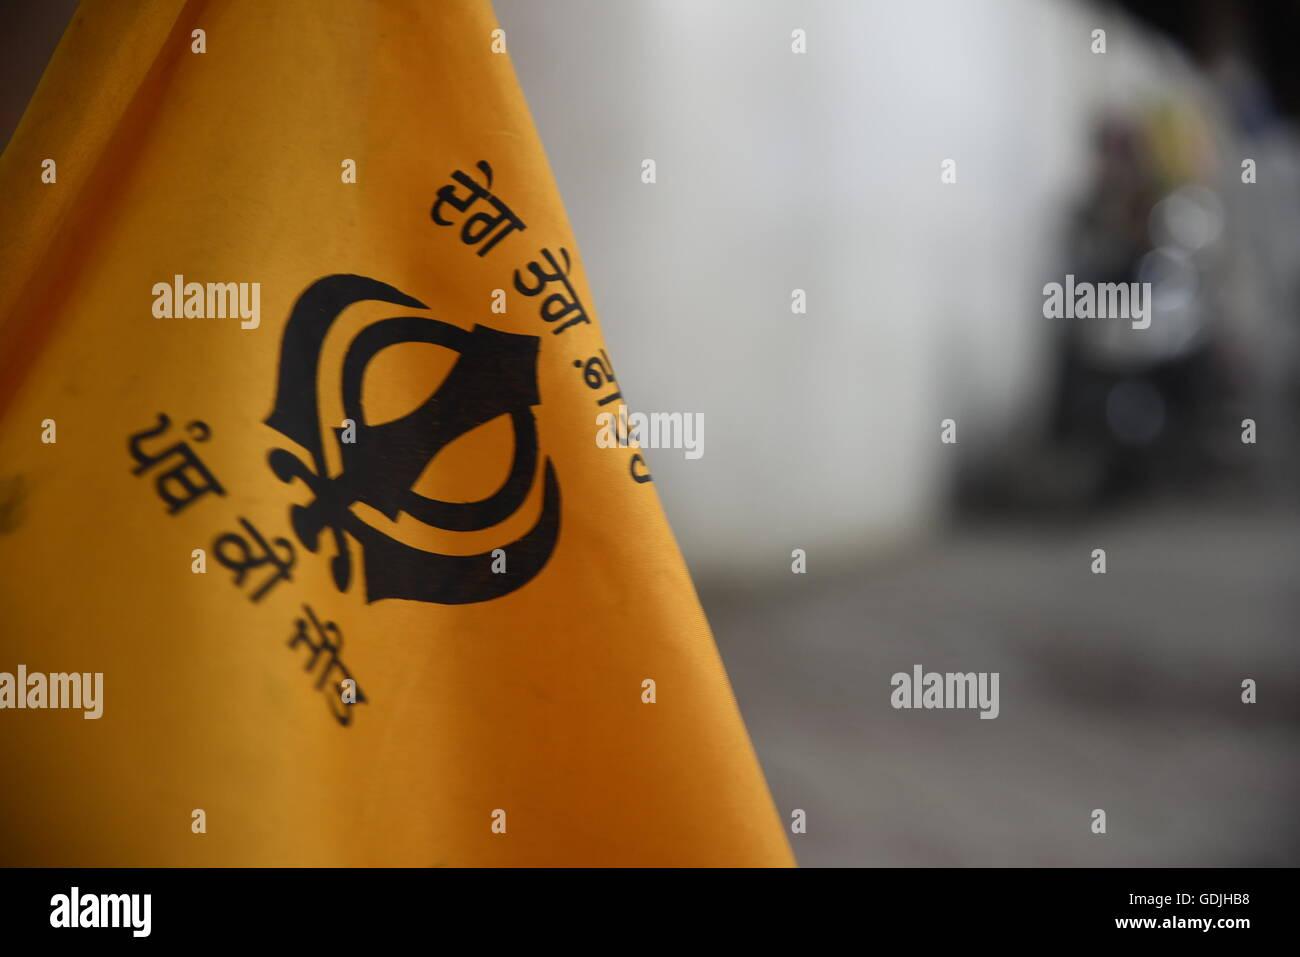 Sikhism Emblem Khanda Religious Symbol Traditional Sikh Flag Has An